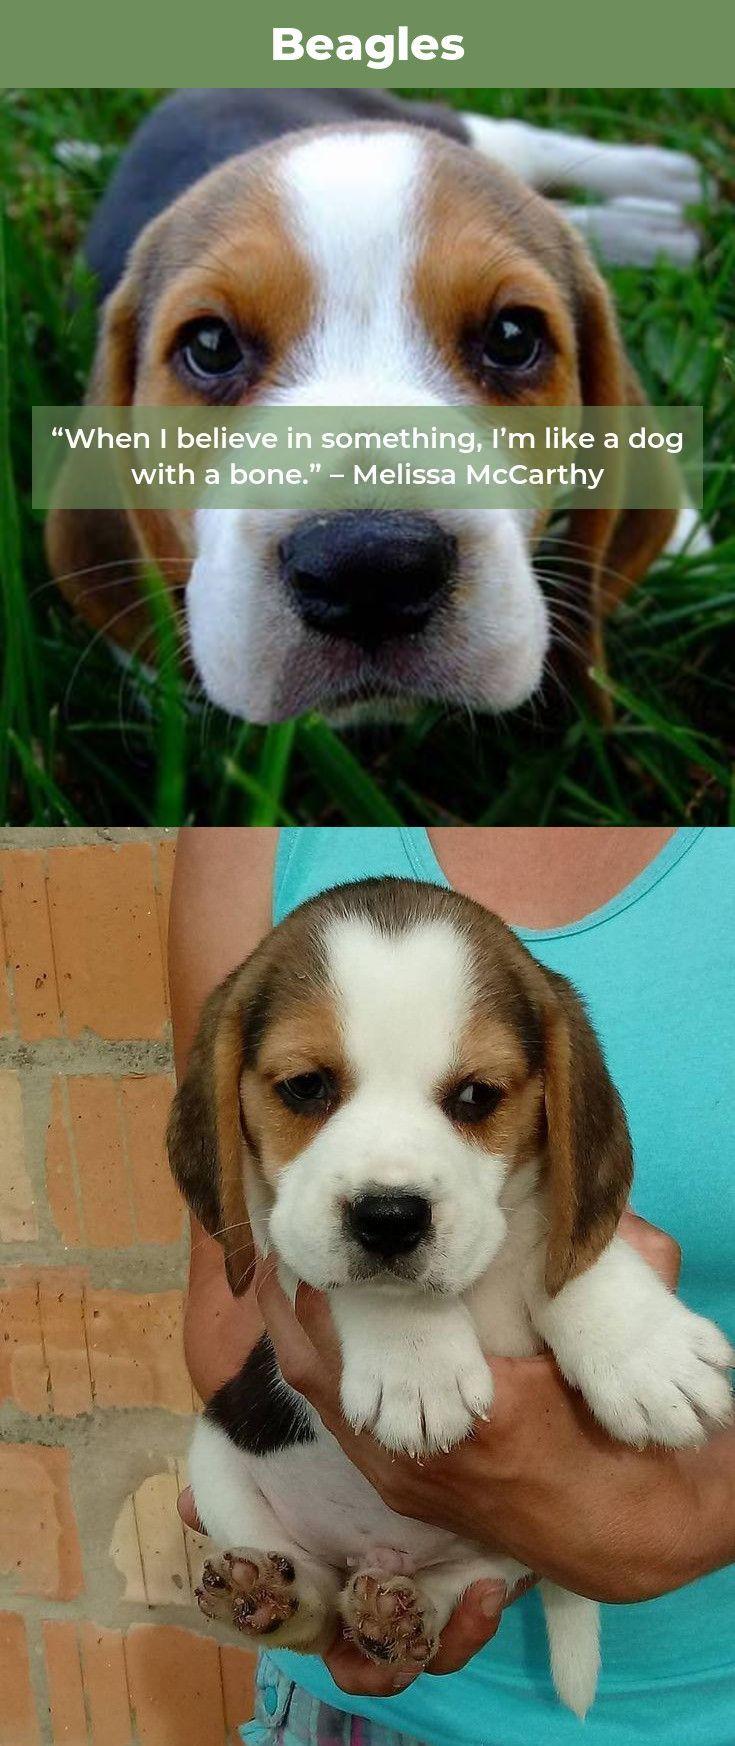 Beagles Pup Beagleoftheday Beagle Beagle Puppy Beagle Art Dogs